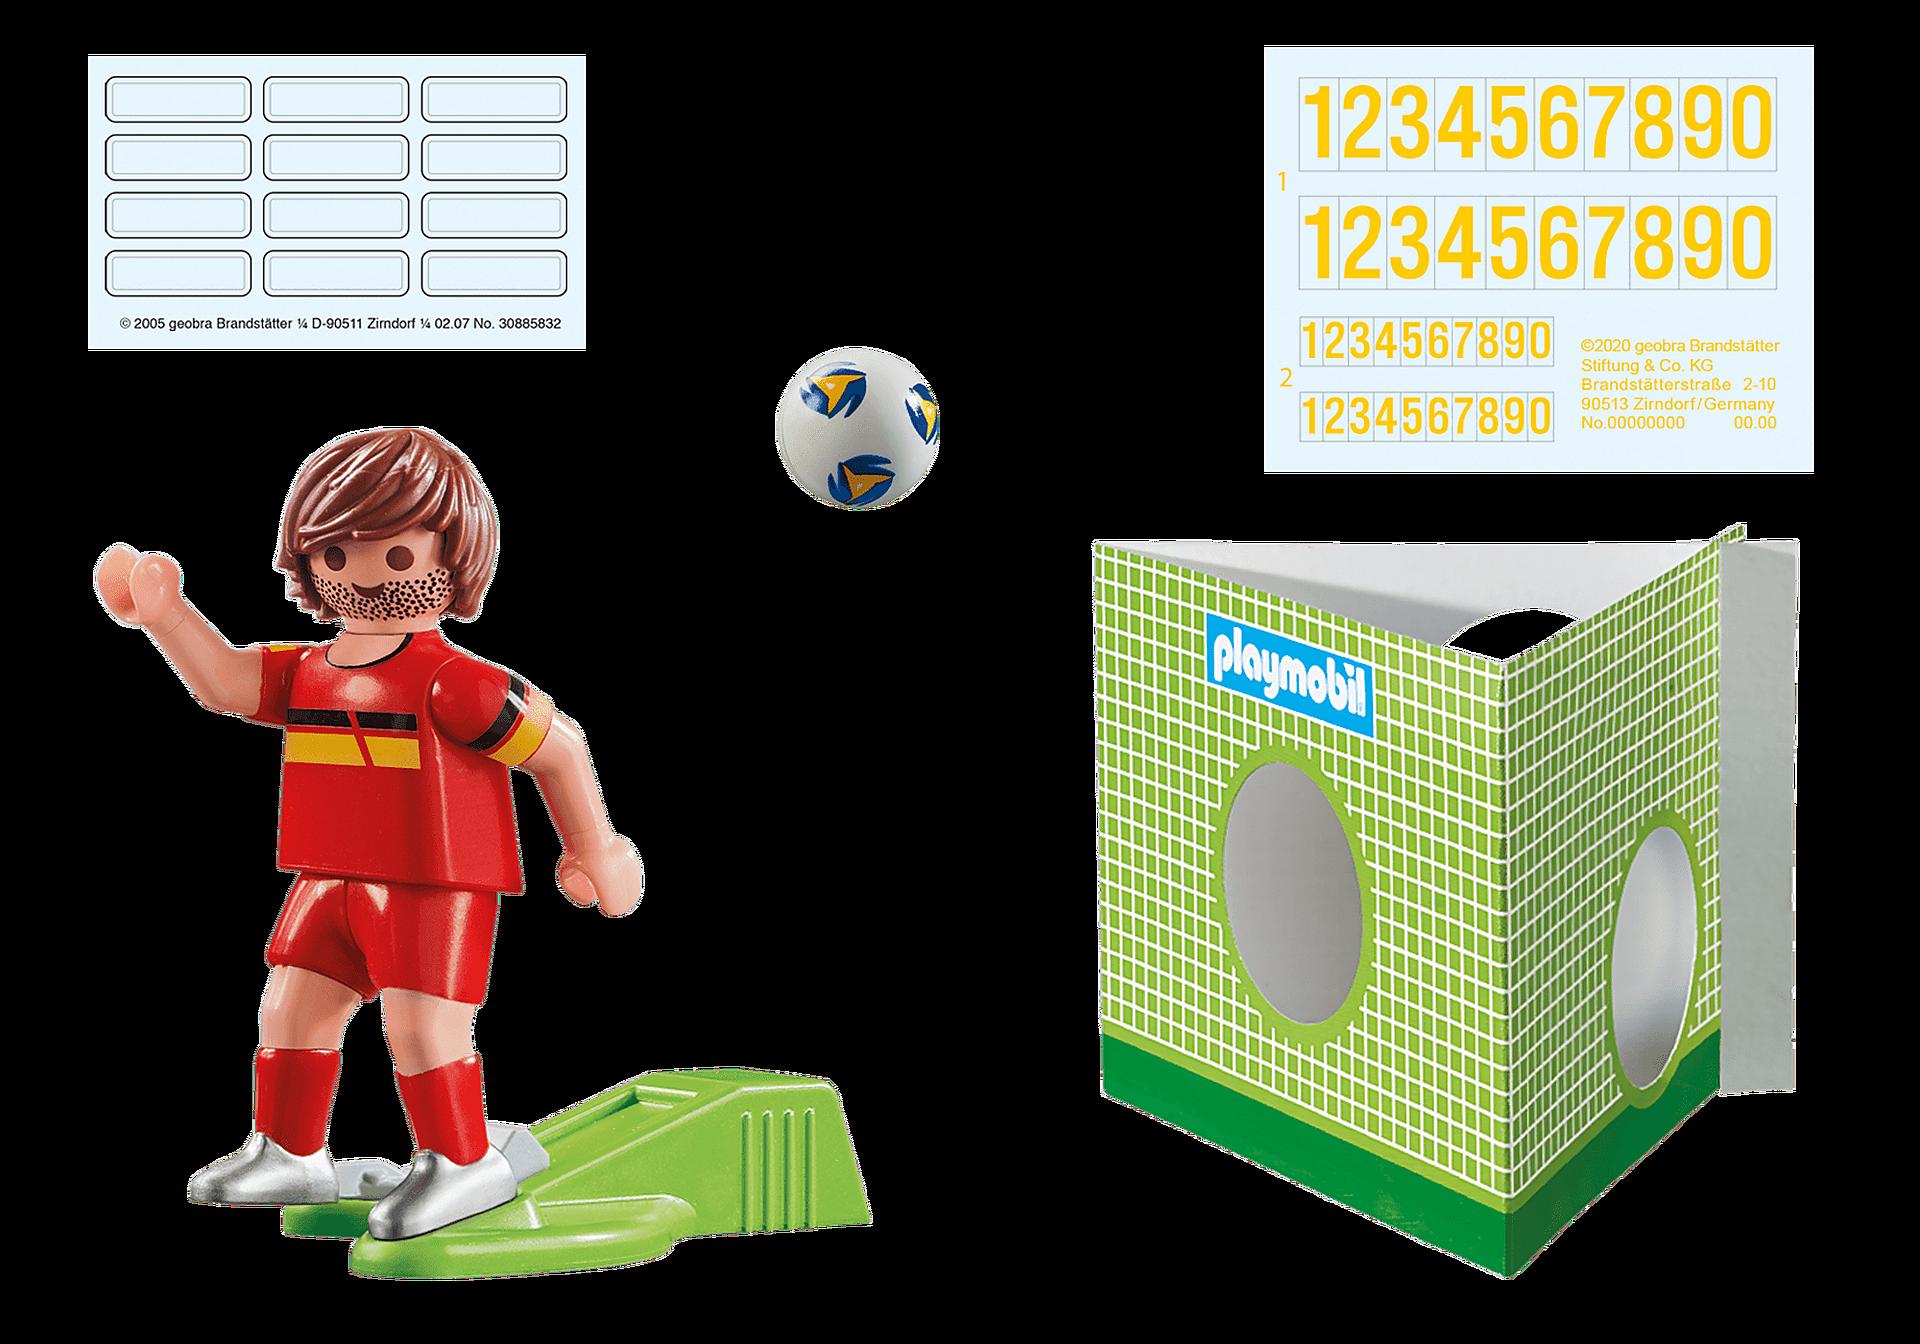 70483 Giocatore Nazionale Belgio zoom image2